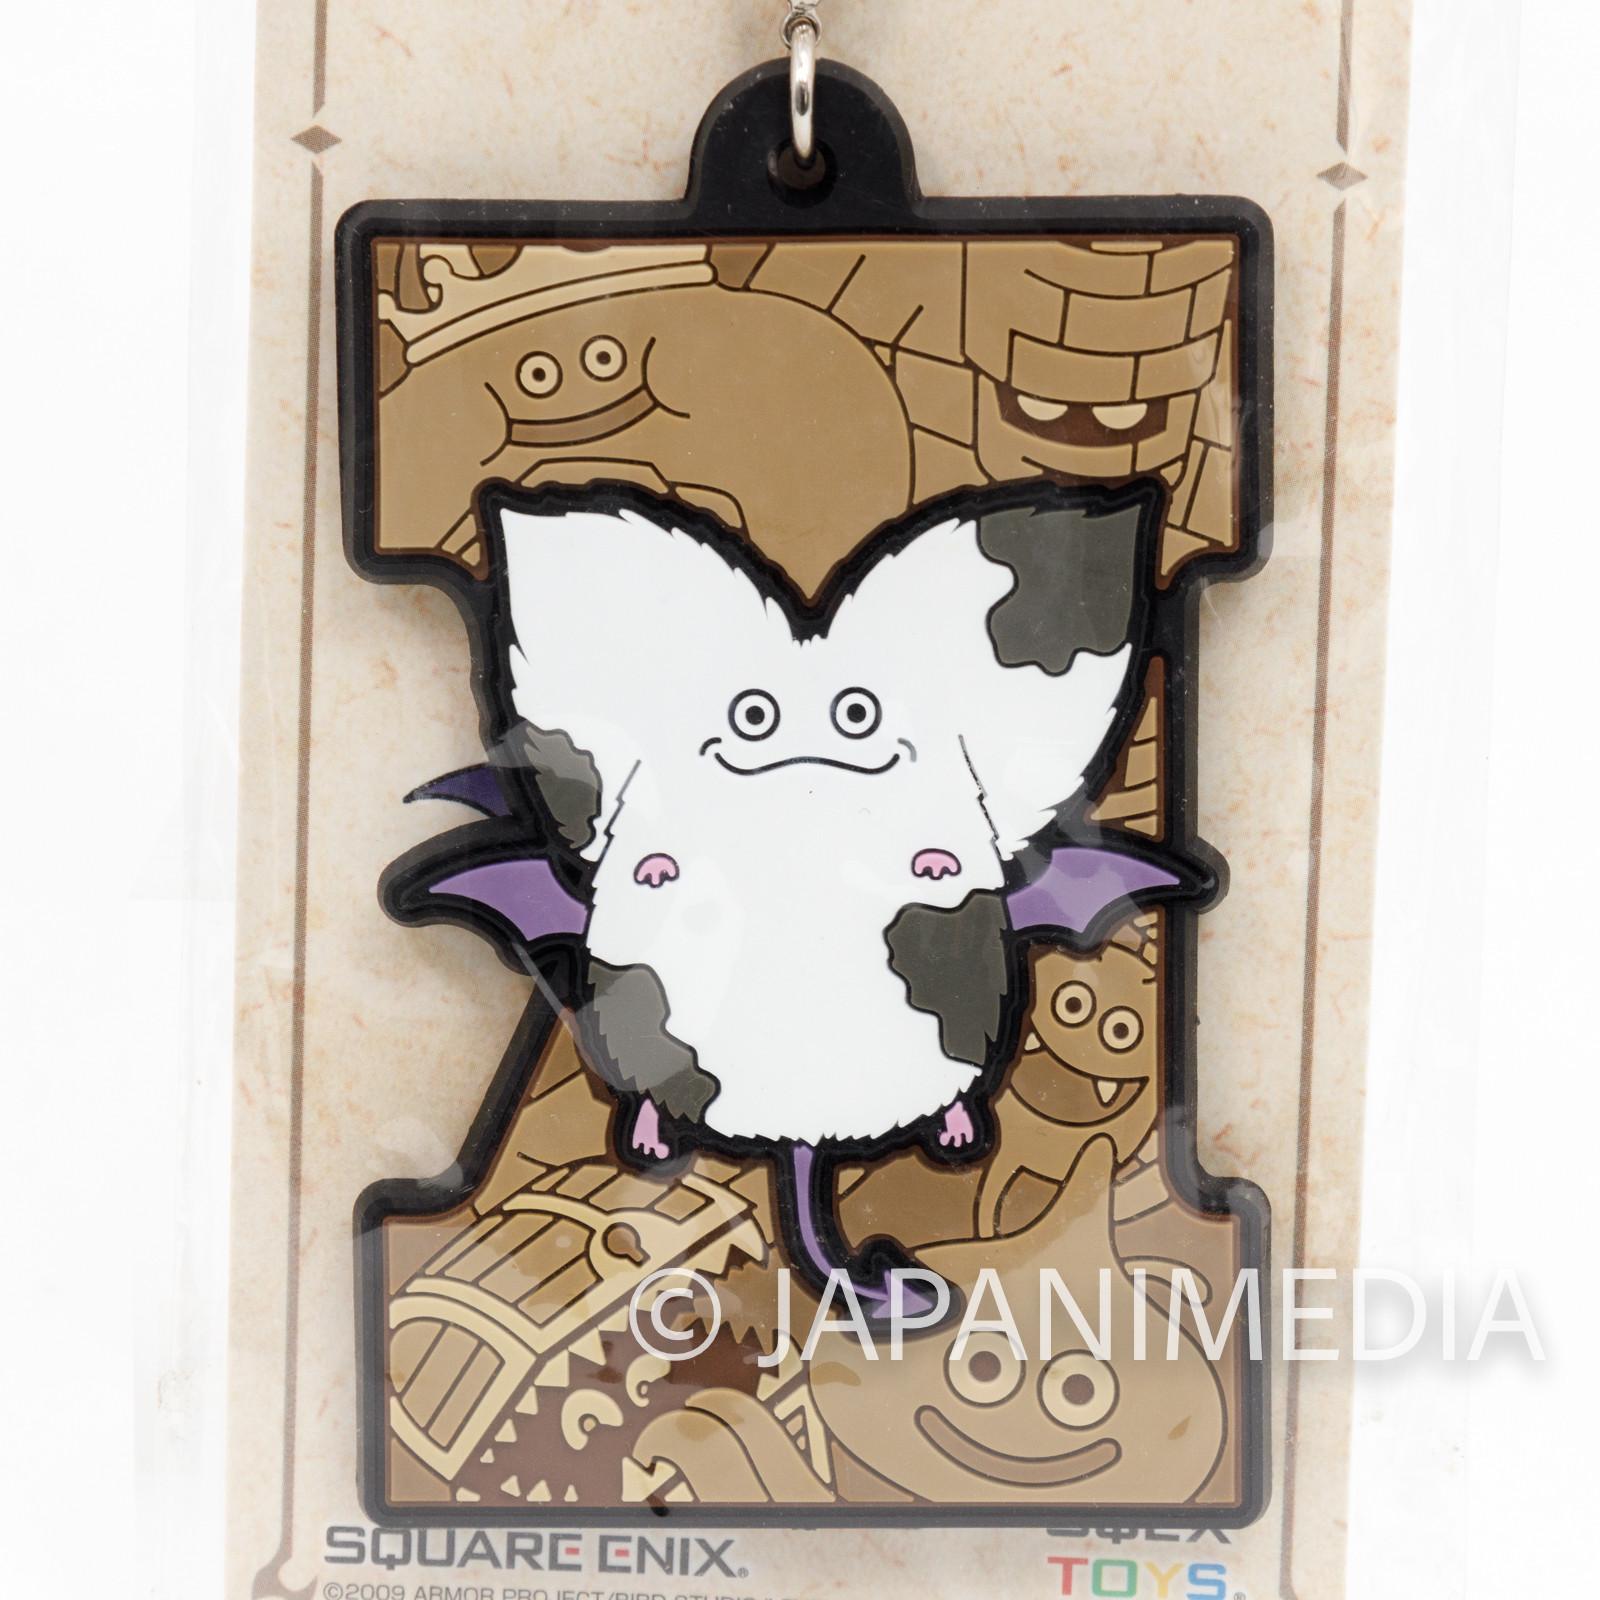 Dragon Quest 9 Monster Teeny Sanguini Rubber Mascot Strap Square Enix WARRIOR